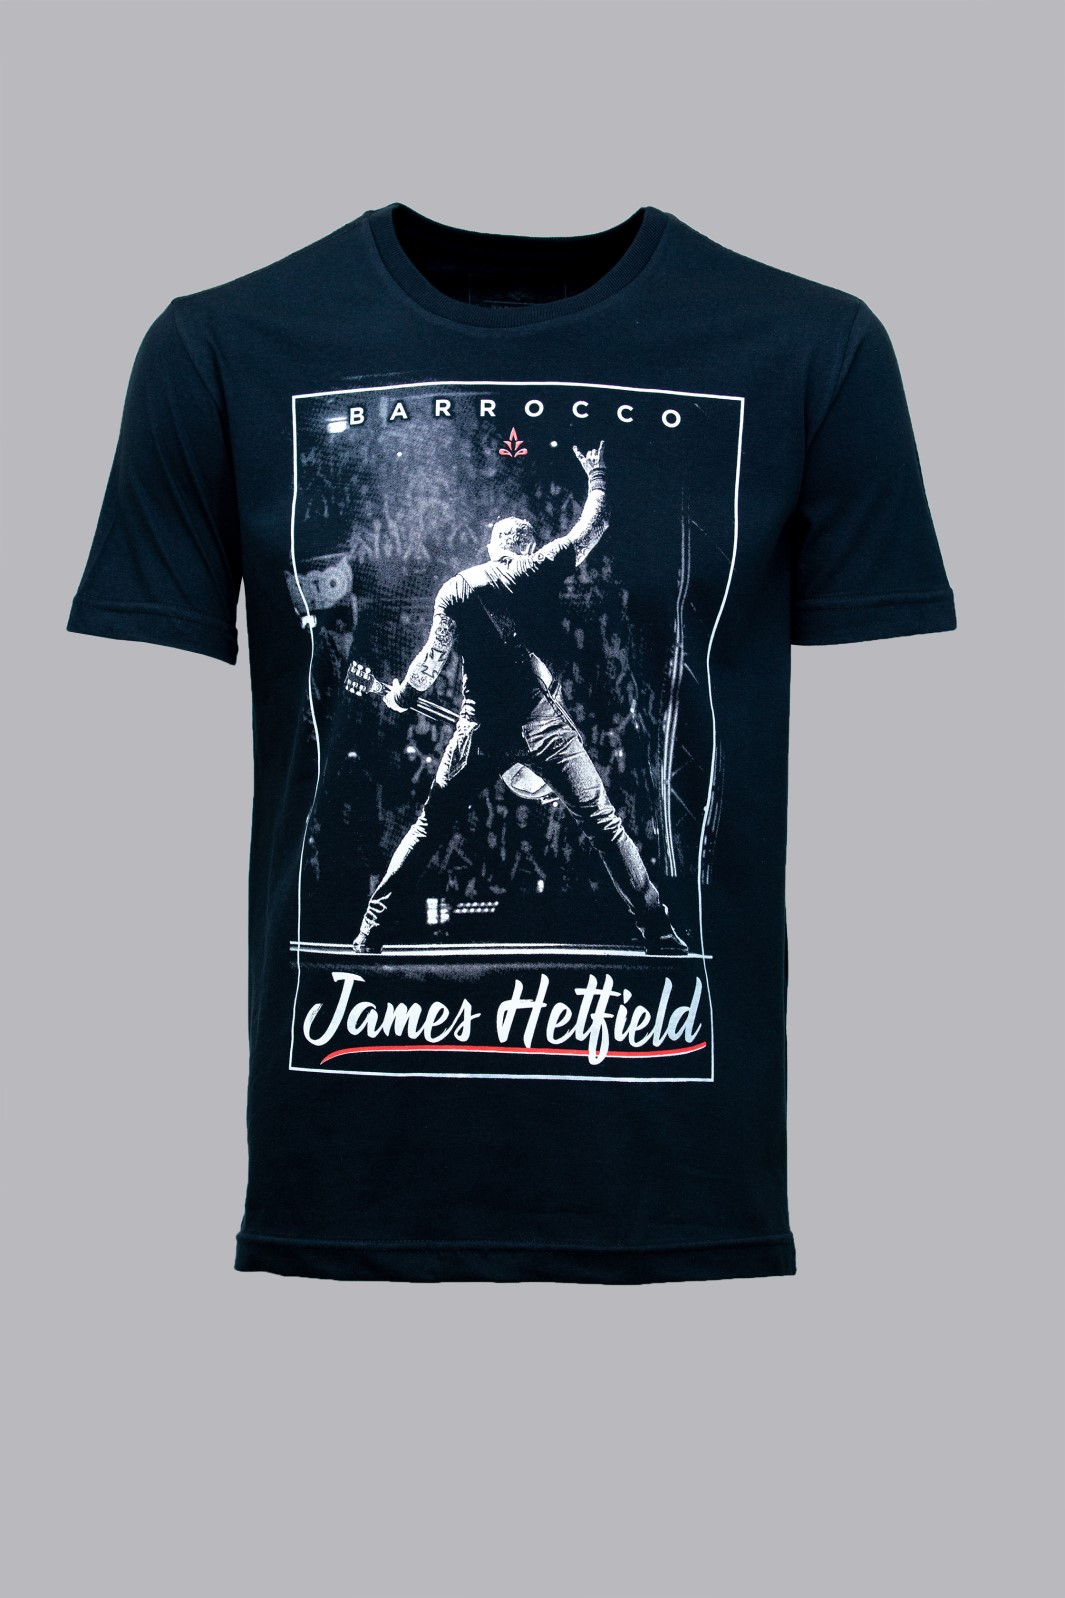 Camiseta Barrocco James Hetfield